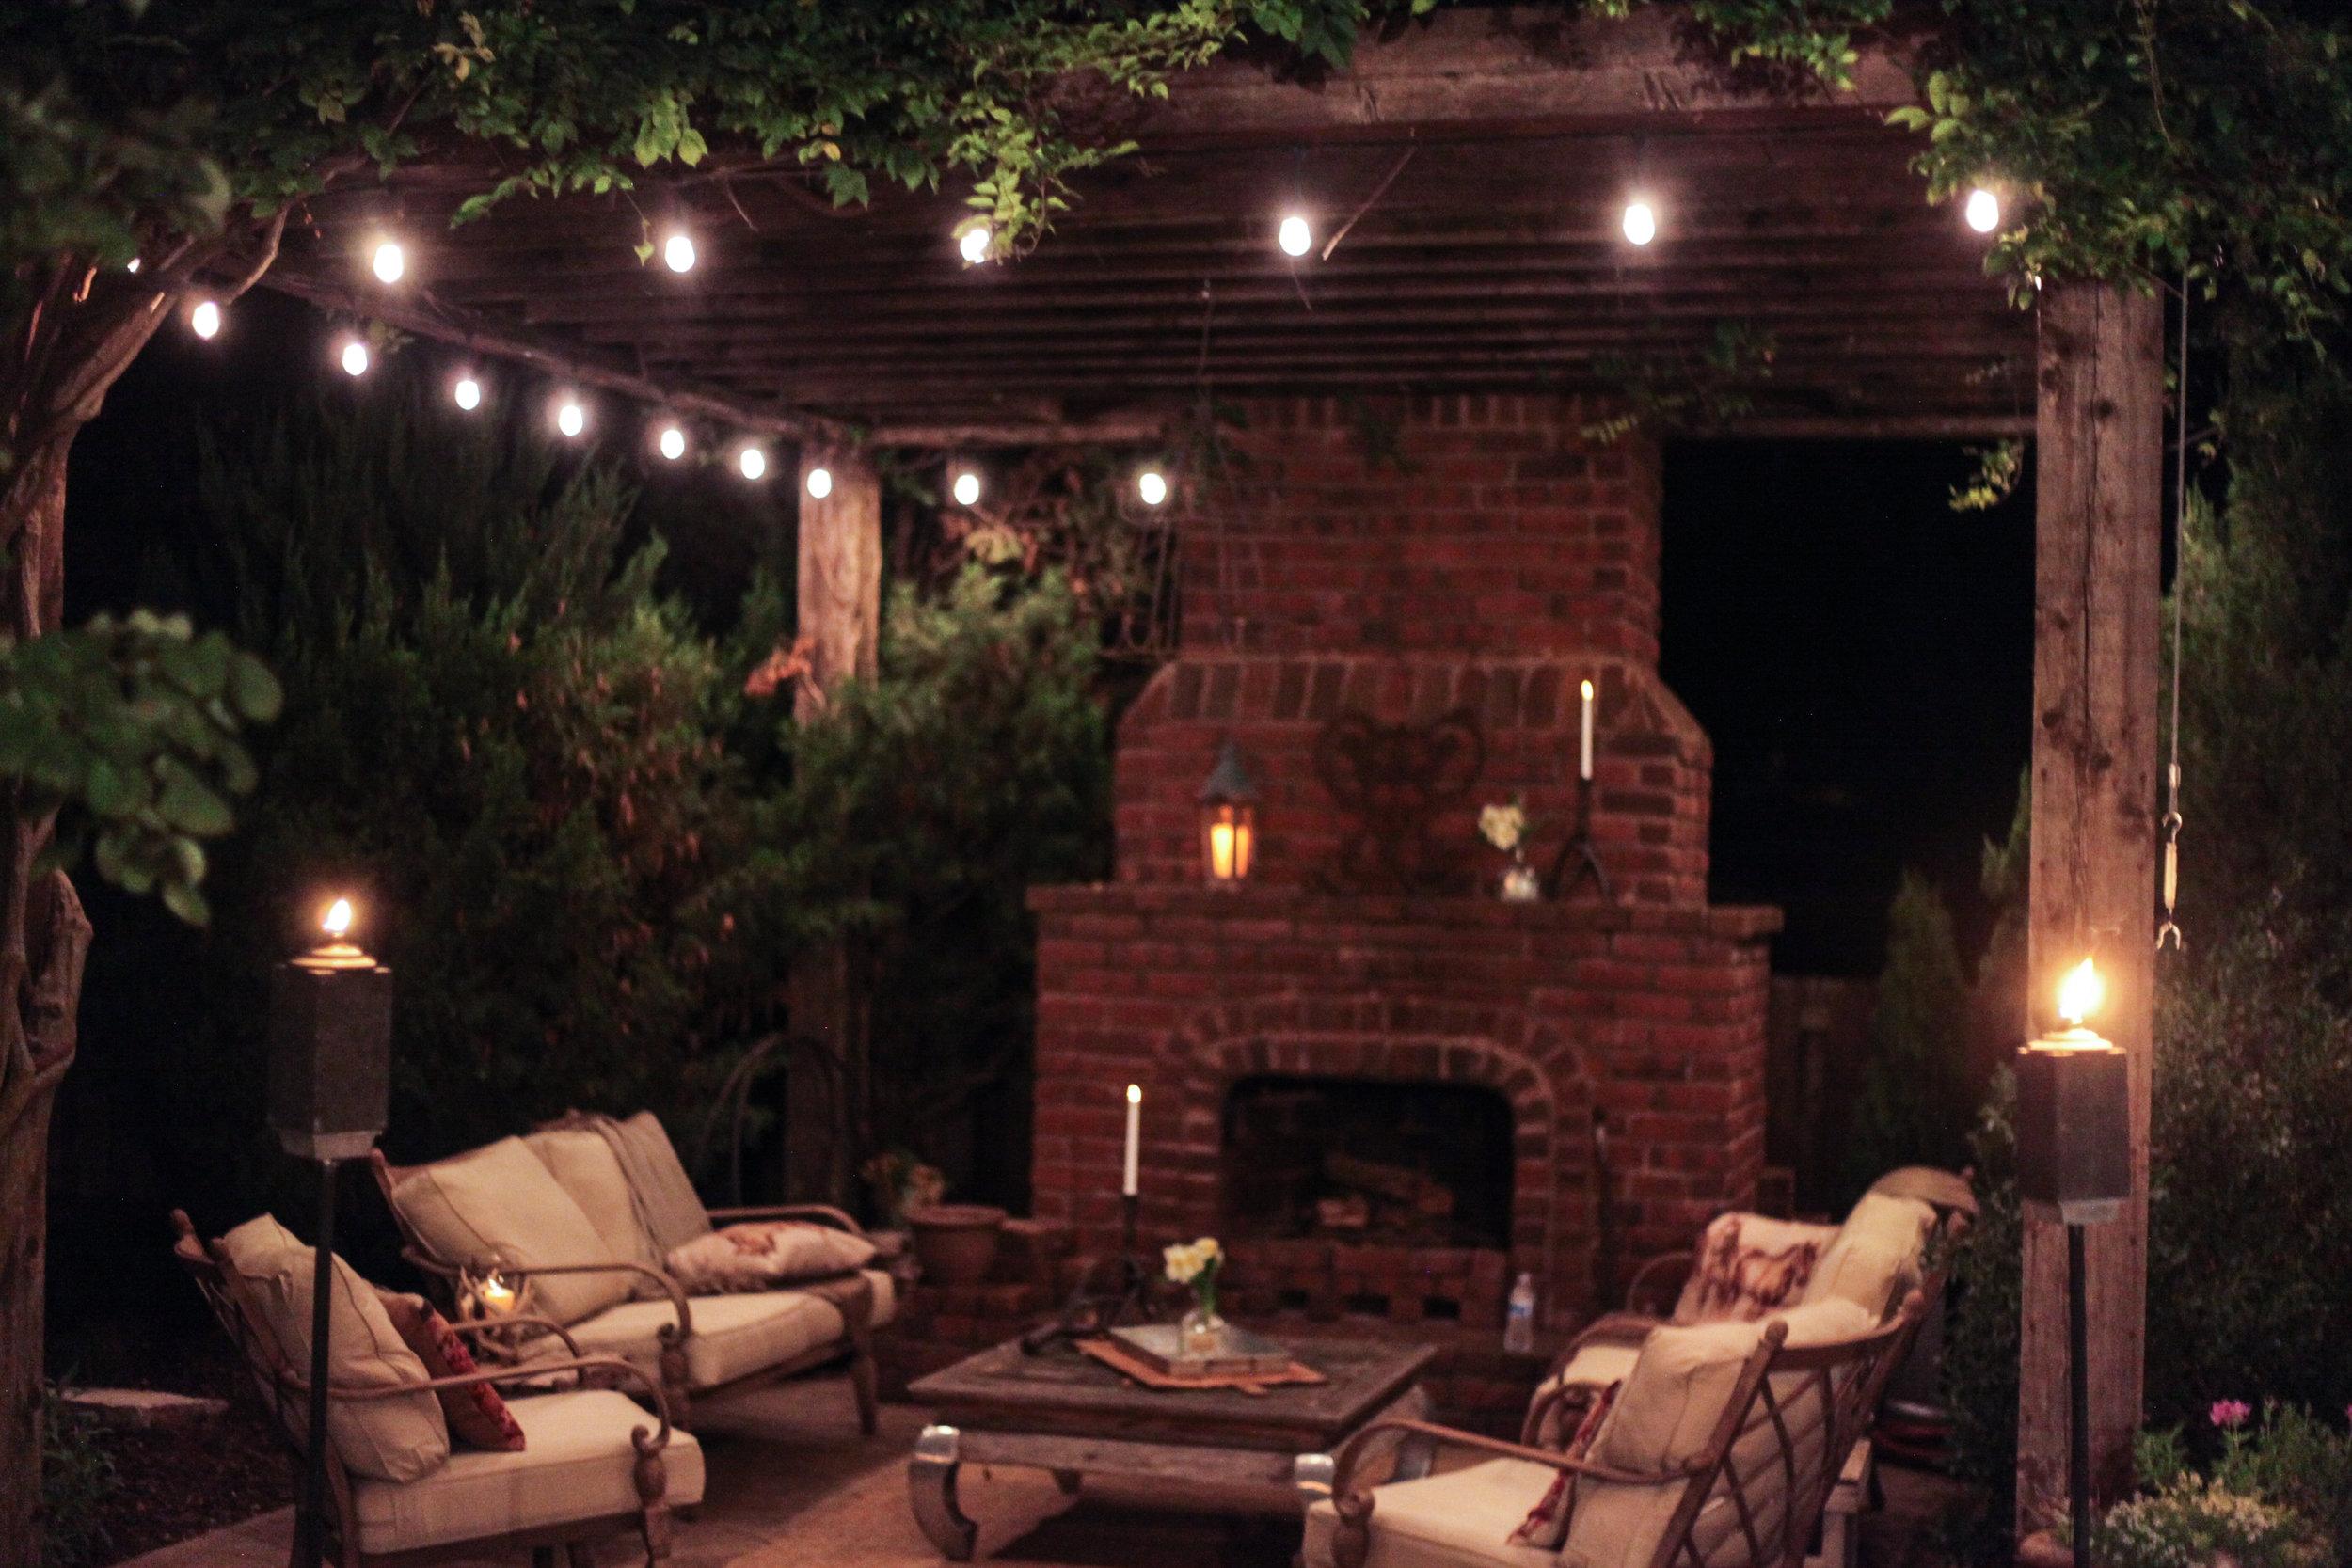 FireplaceNight.jpg